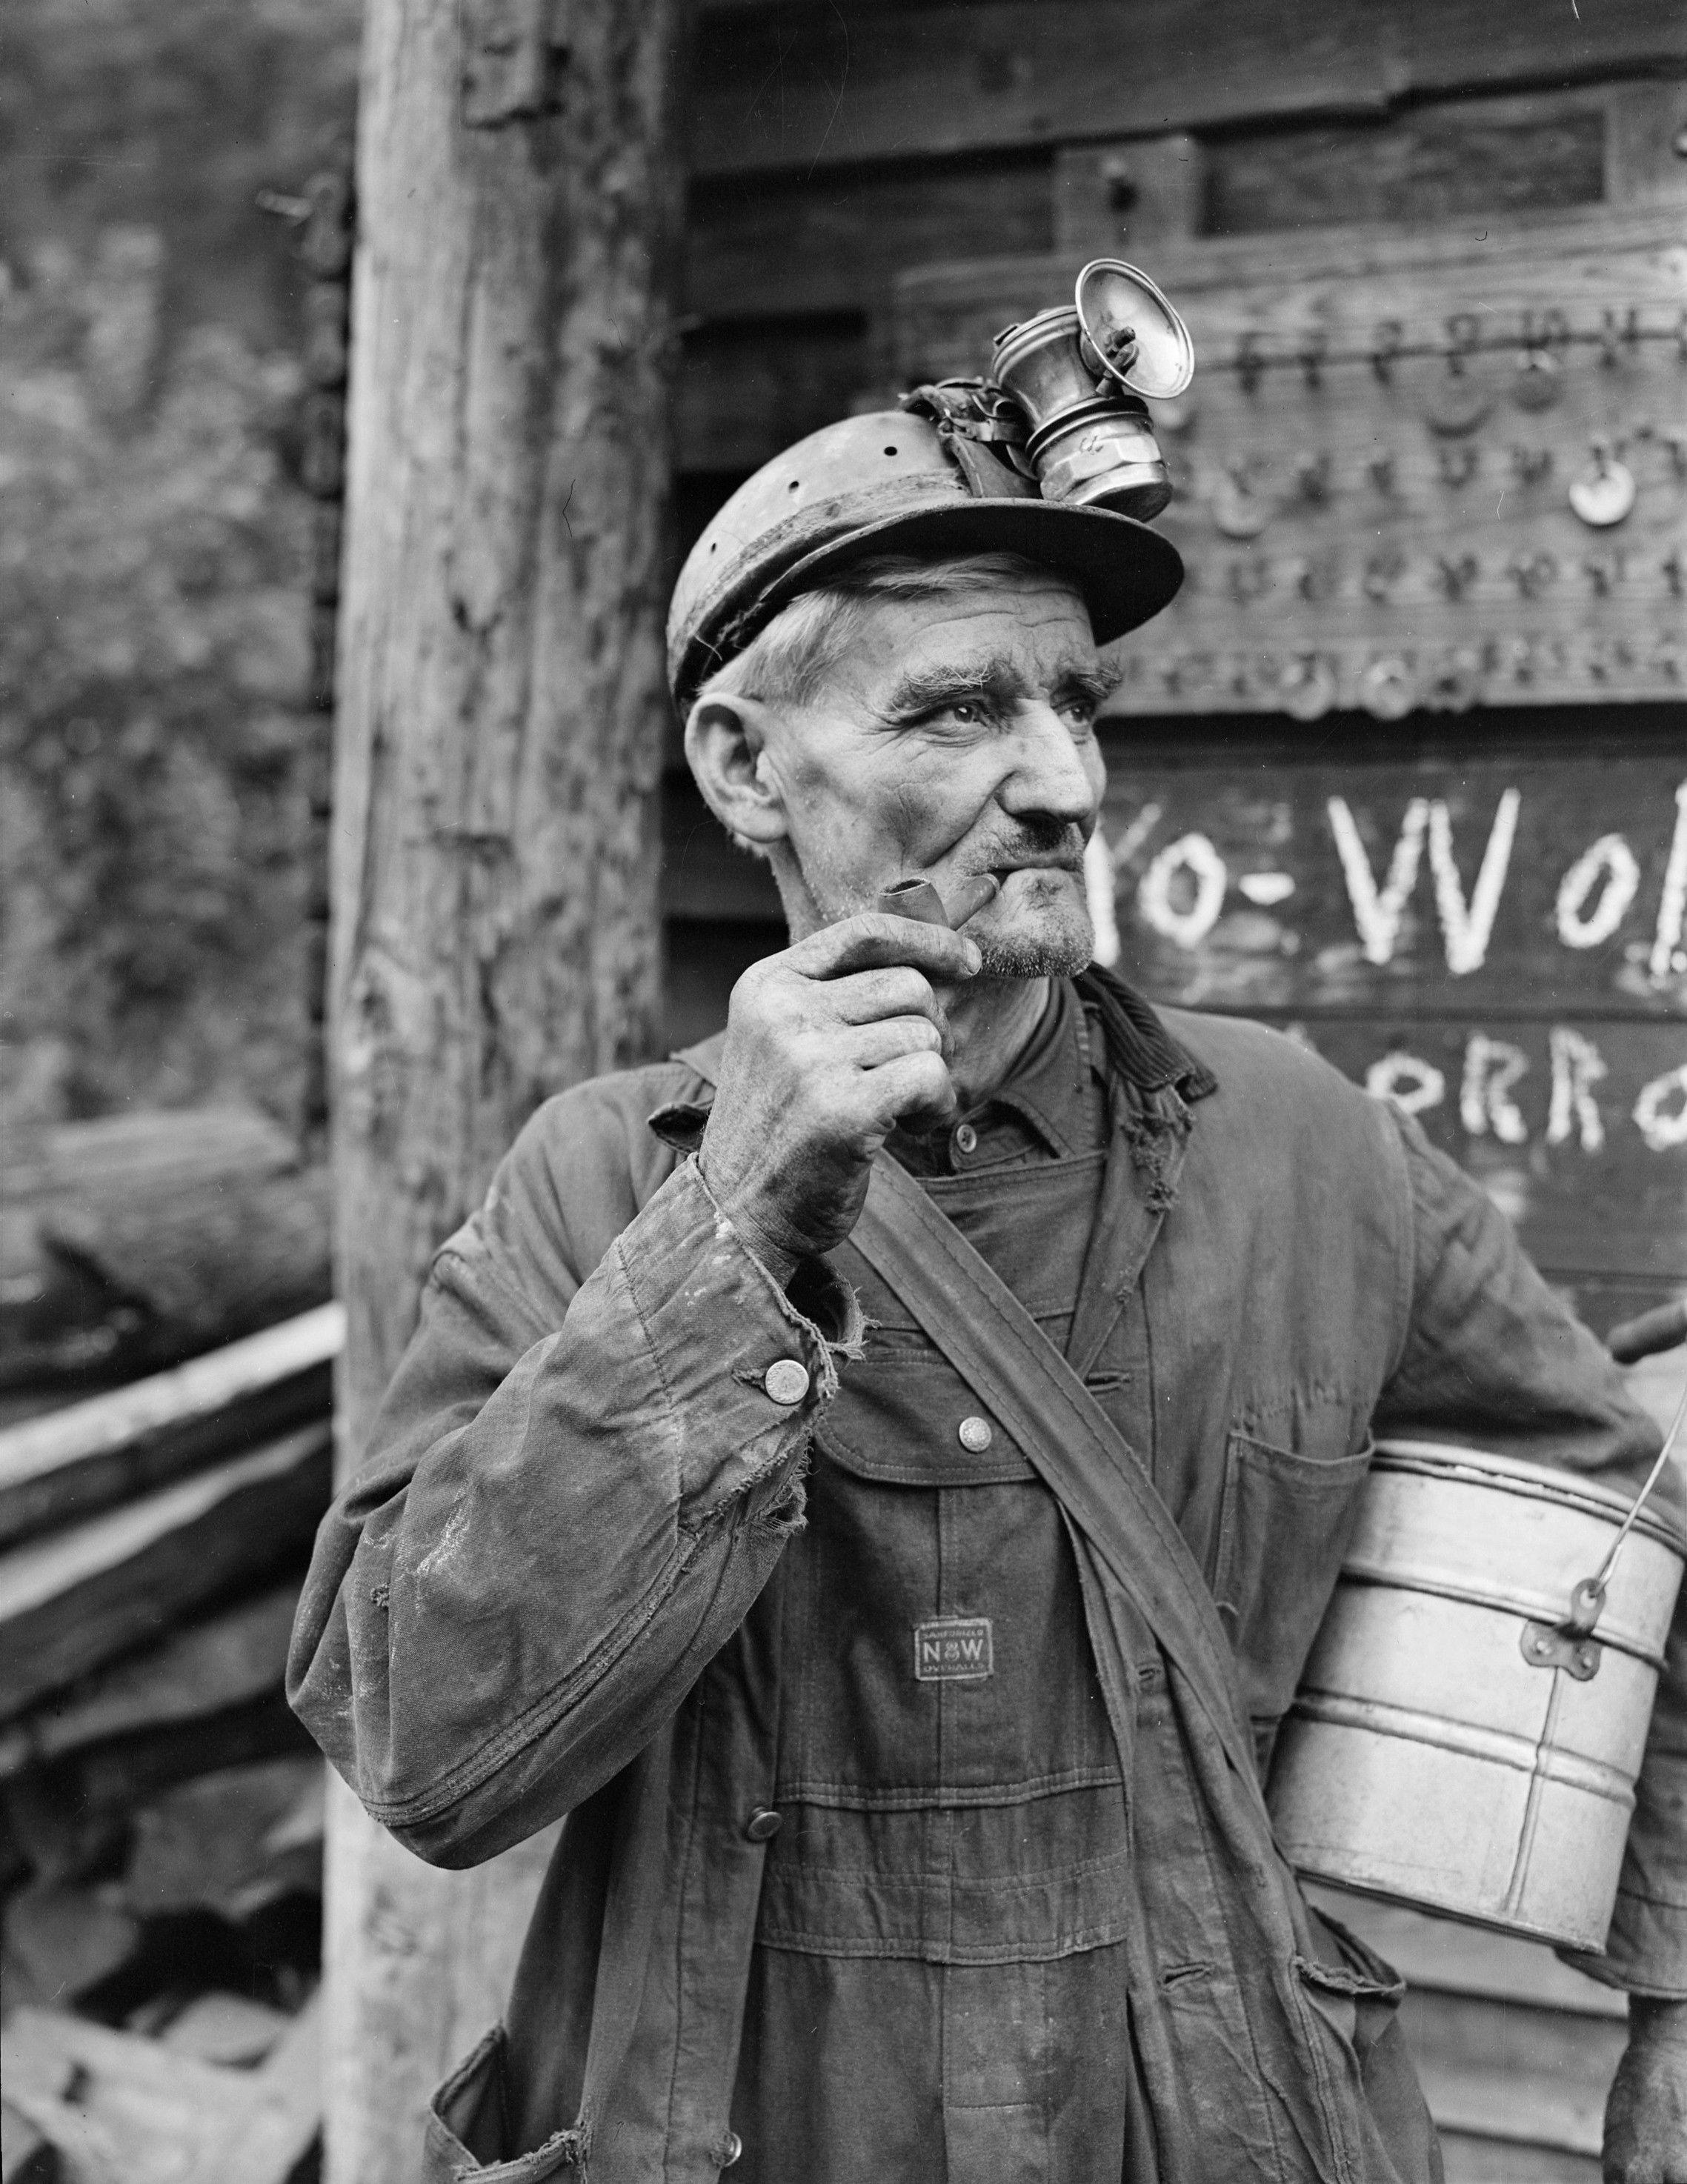 508b5014925 research coal miner lantern hat... I wish I had a photo of my grampa like  this!